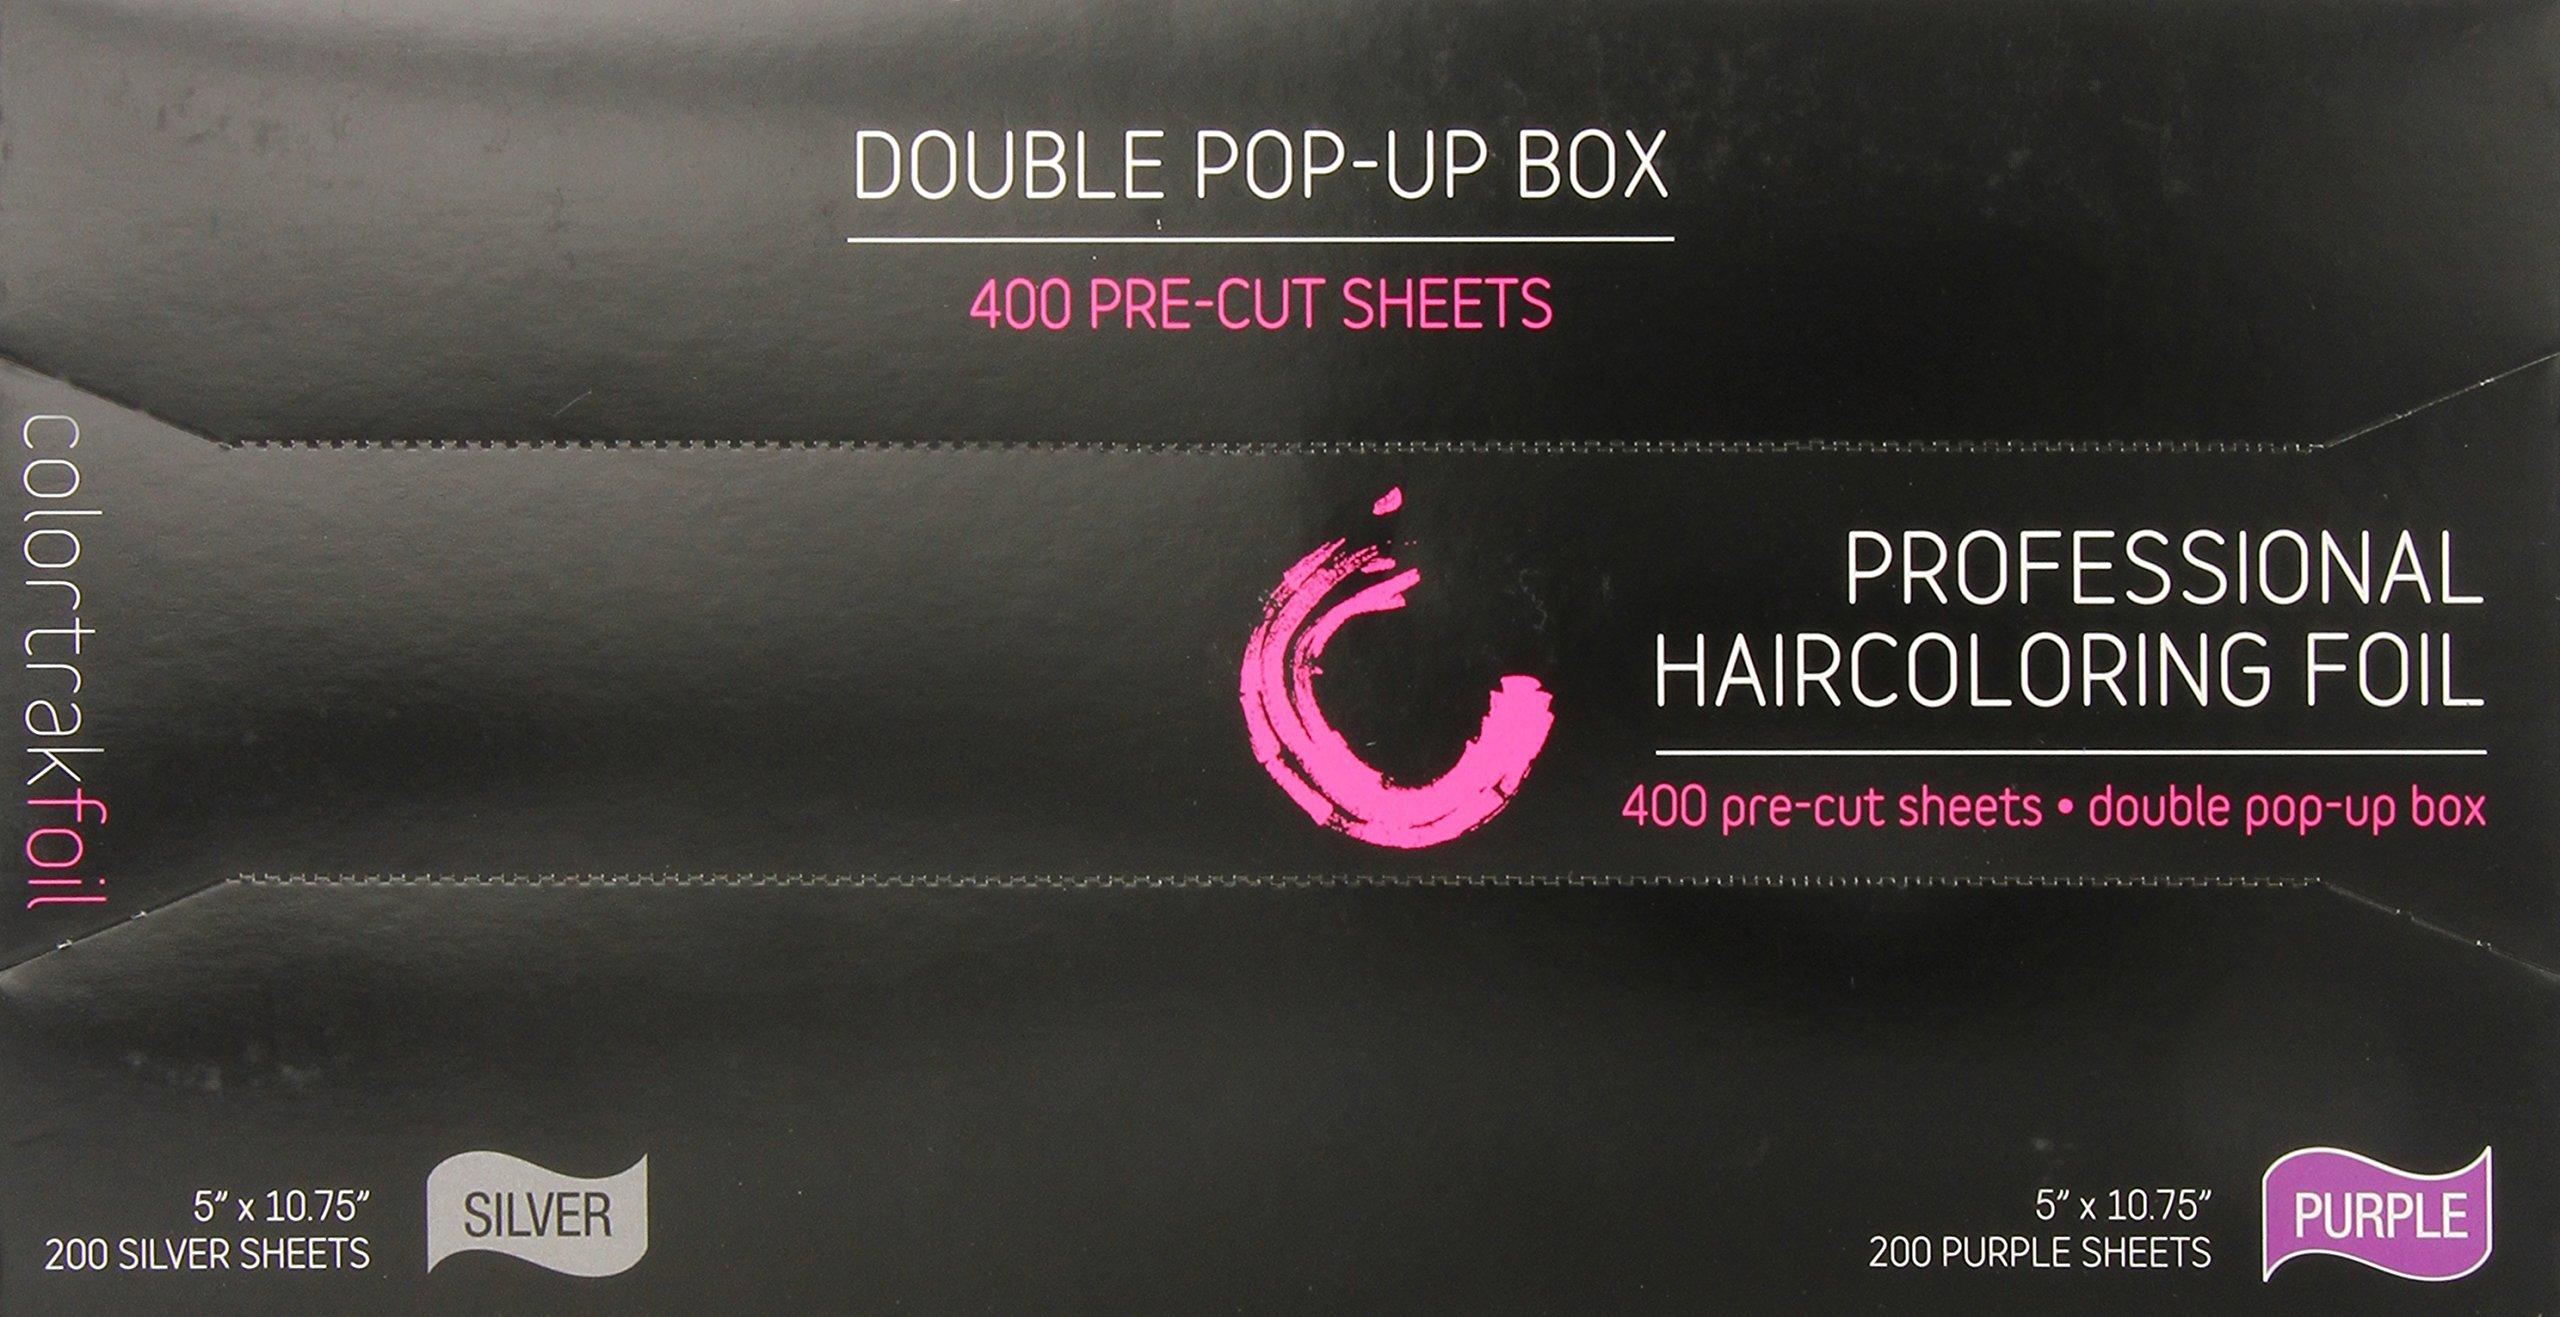 Colortrak Professional Dual Dispenser Pop-up Coloring / Highlighting Foil Sheets, Purple / Silver (400 Count)